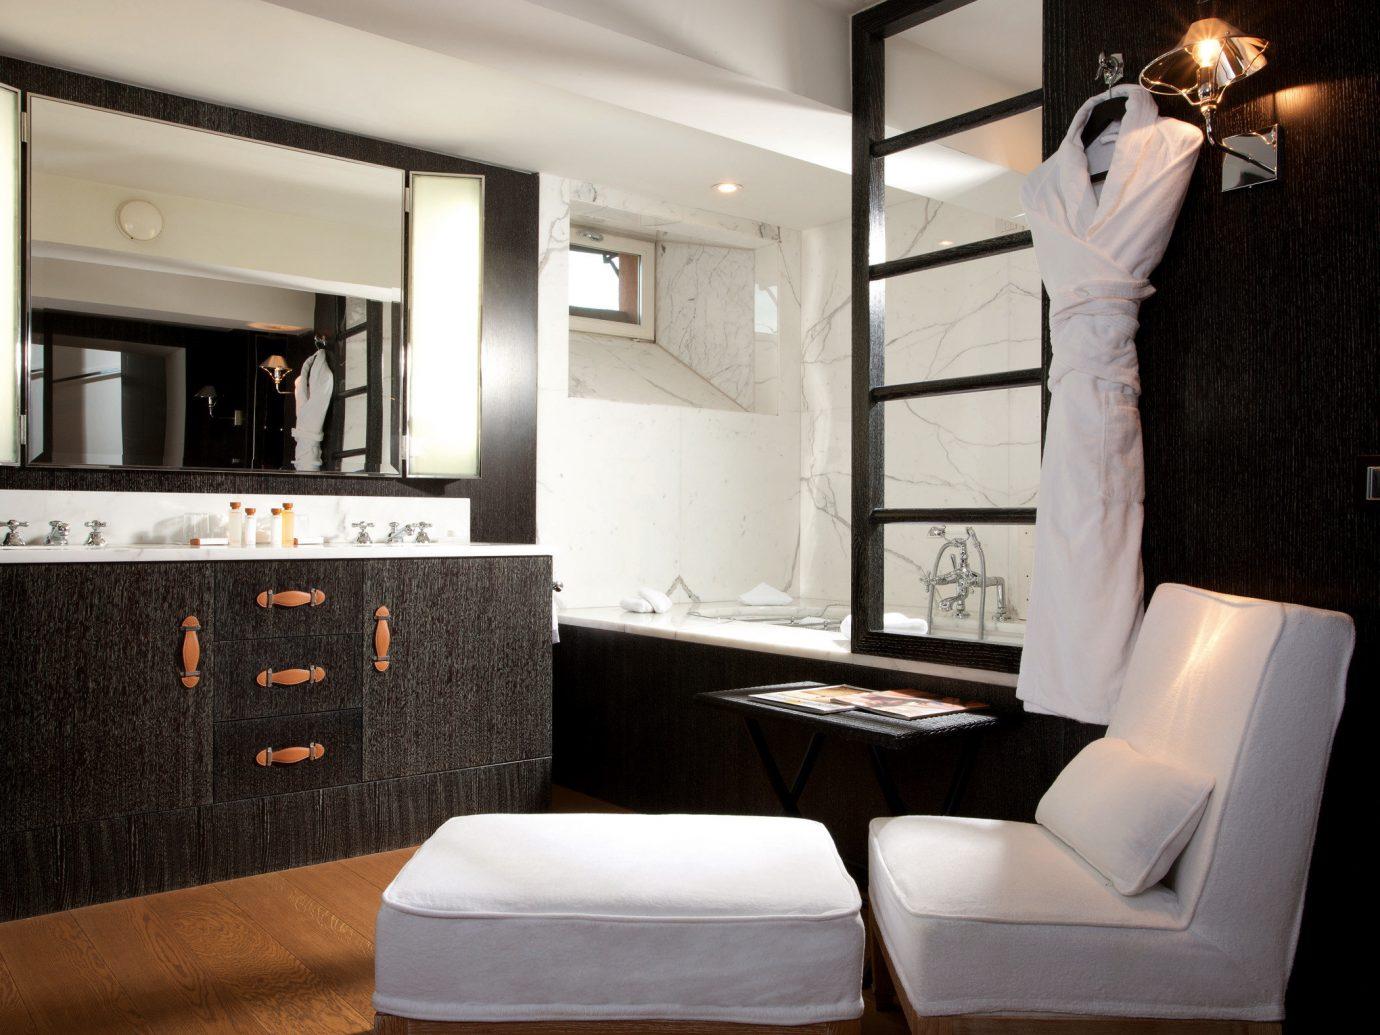 Bath Boutique Hotels Hotels Luxury Modern indoor wall white ceiling room interior design living room home floor Design lighting